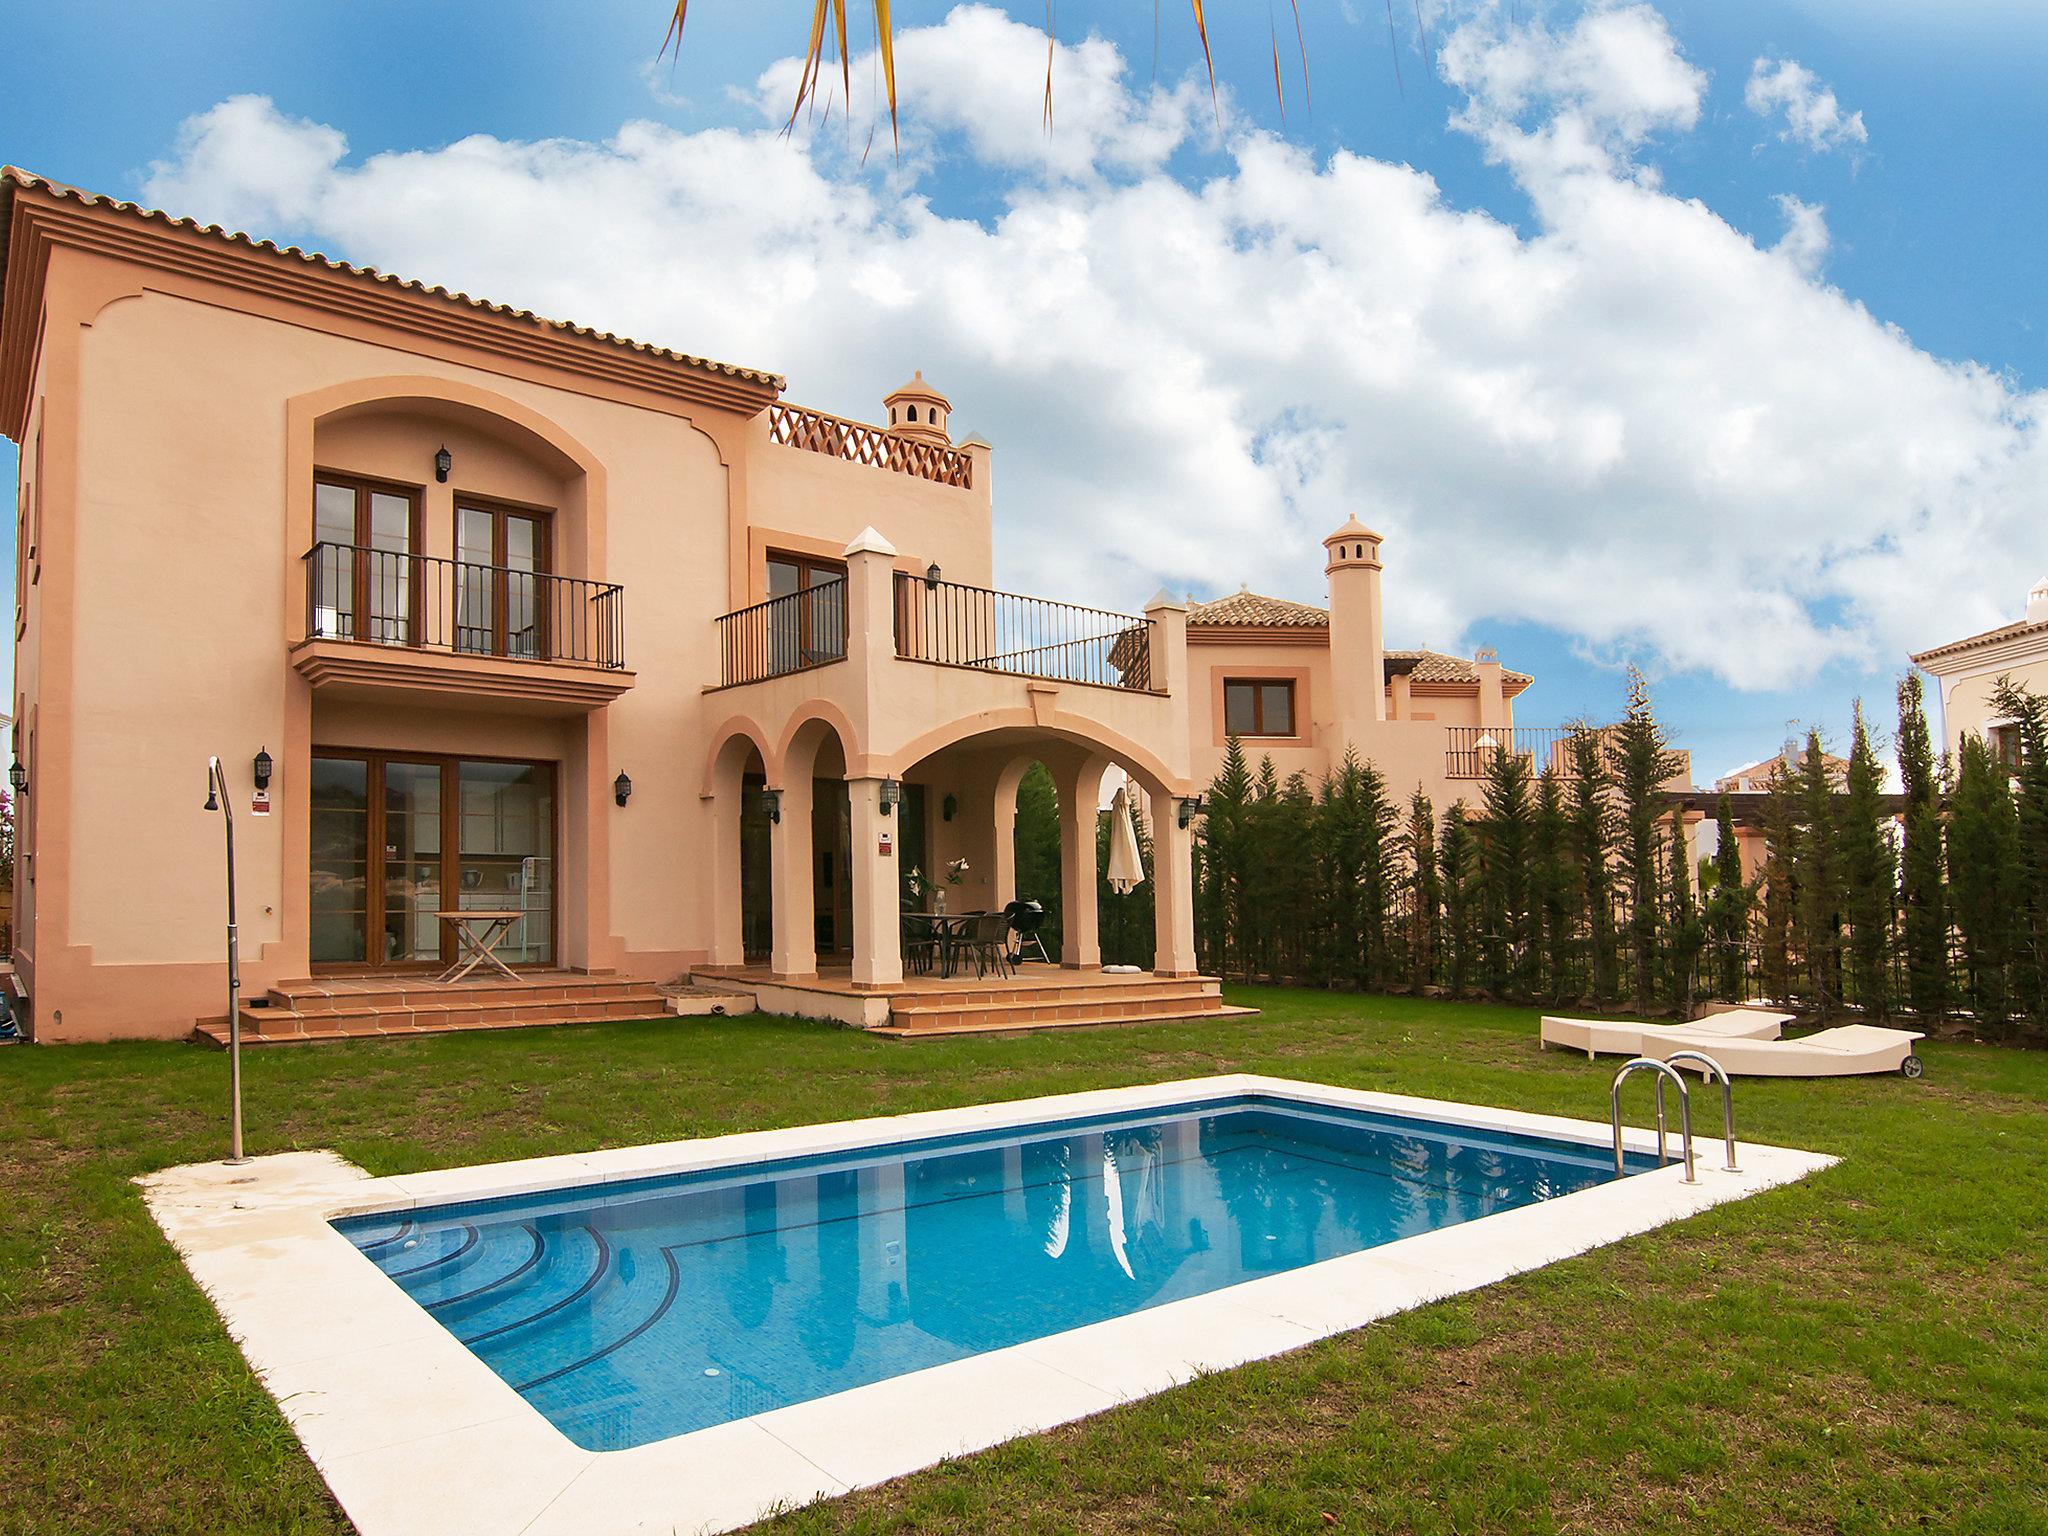 location villa estepona costa del sol maison espagne granadillas. Black Bedroom Furniture Sets. Home Design Ideas